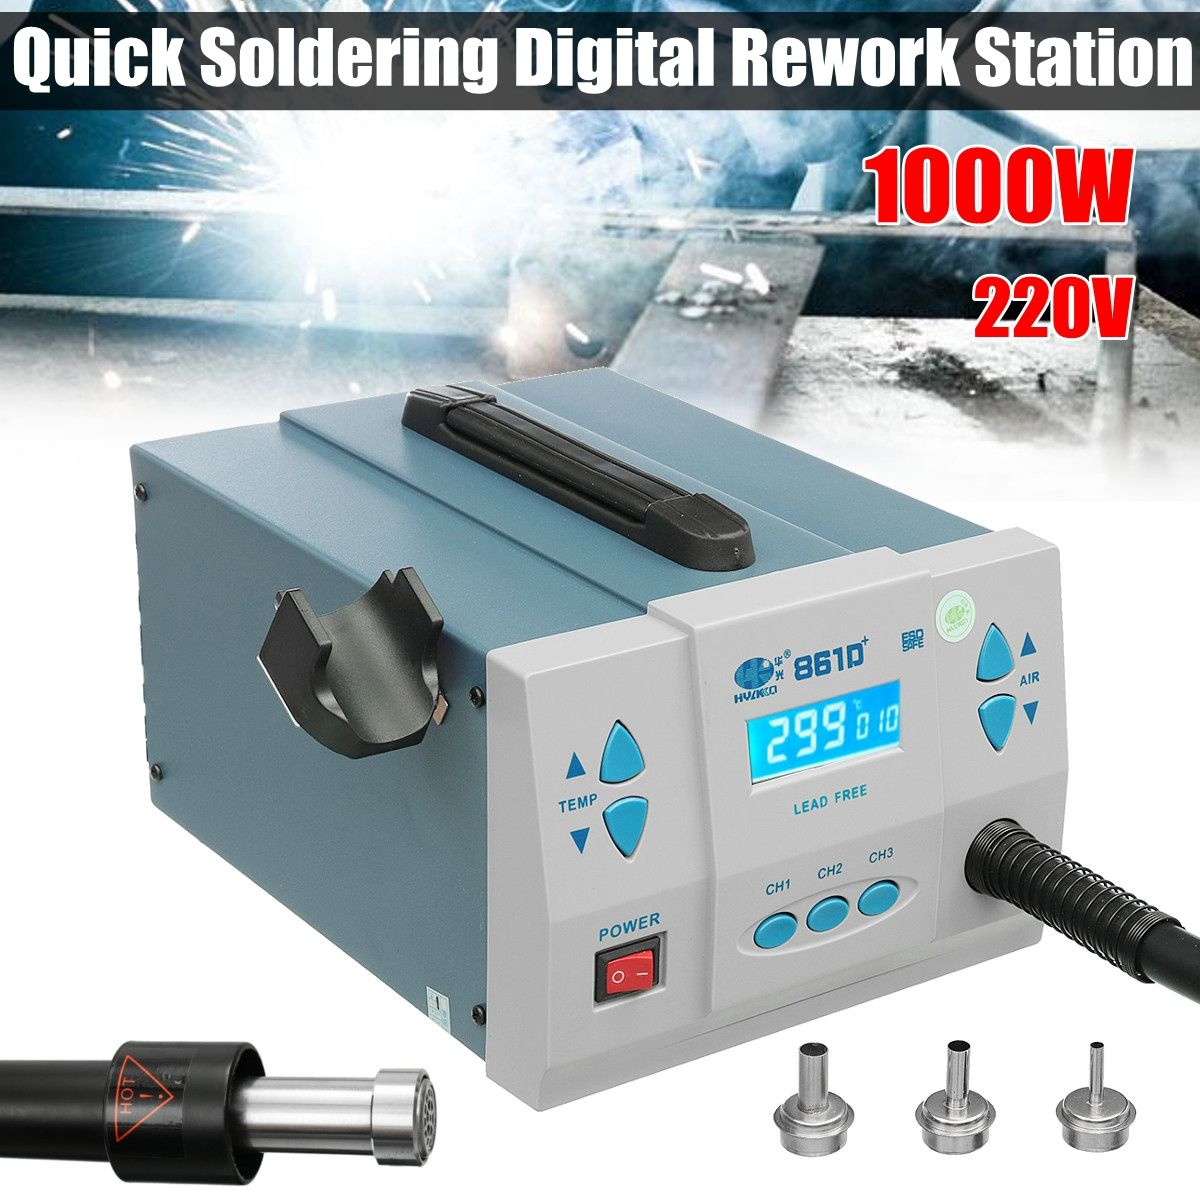 1000W Thermostatic Quick Soldering Digital Rework Station Lead-free Desoldering